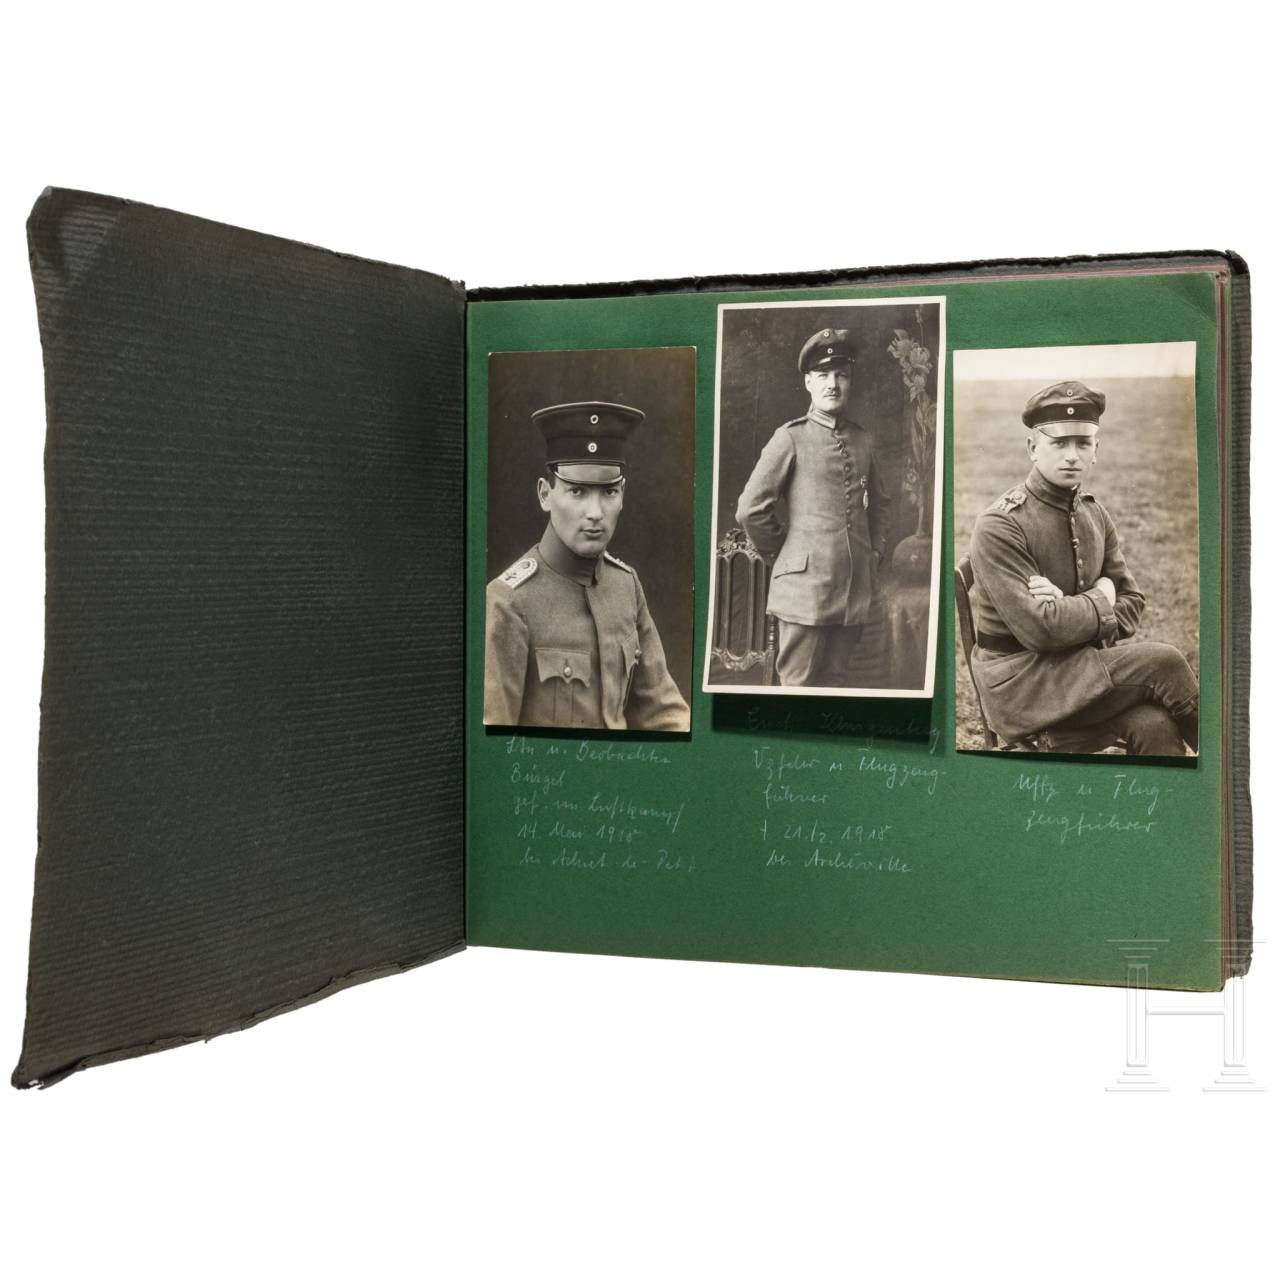 Fotoalbum der Fliegerabteilung 235 (Artillerie) an der Westfront 1917/18